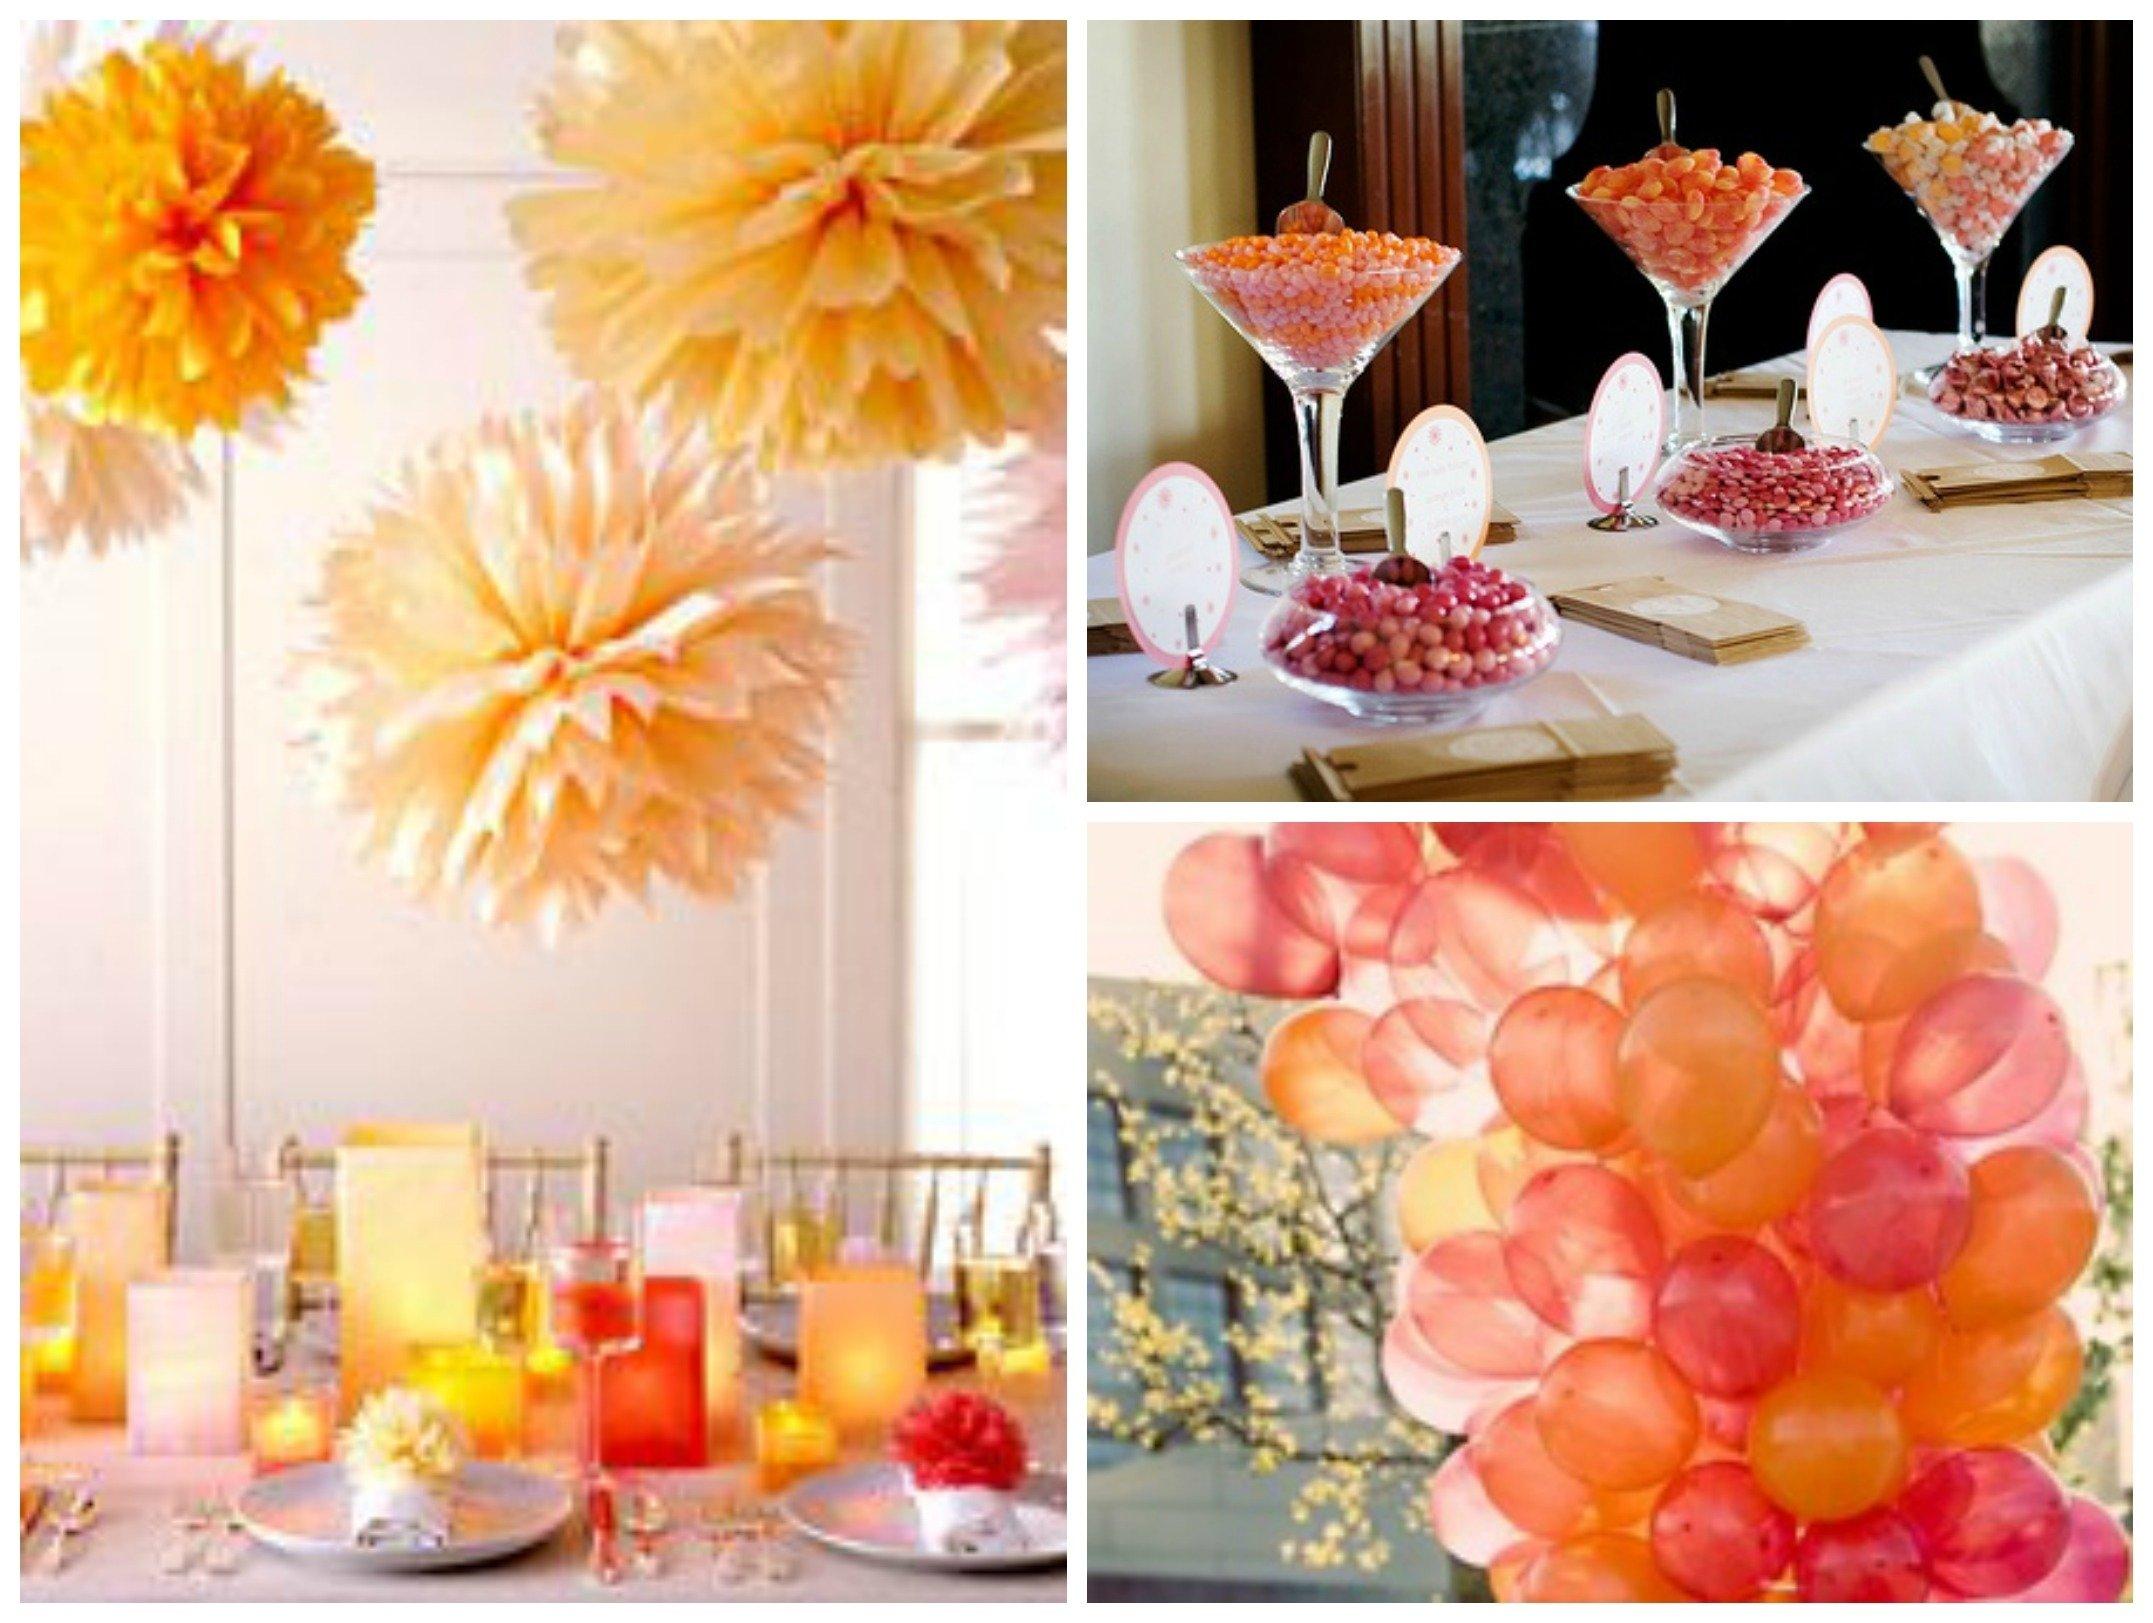 10 Lovable Bridal Shower Ideas On Pinterest photo bridal shower journal ideas image 2020